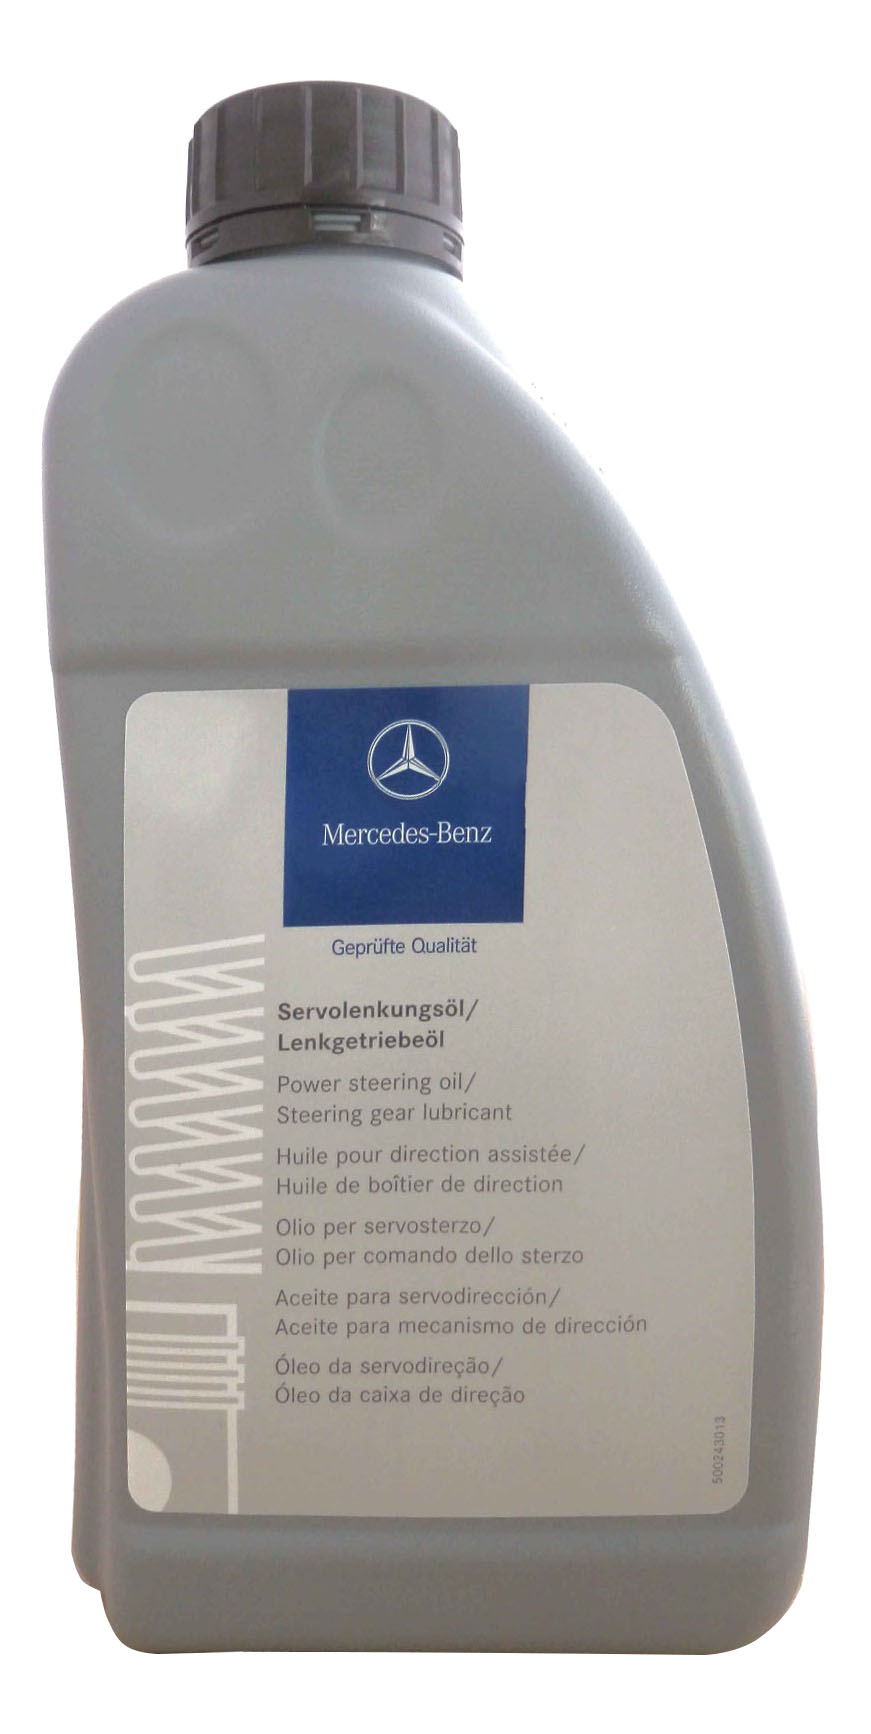 Гидравлическое масло Mercedes Benz 1л A000989880310